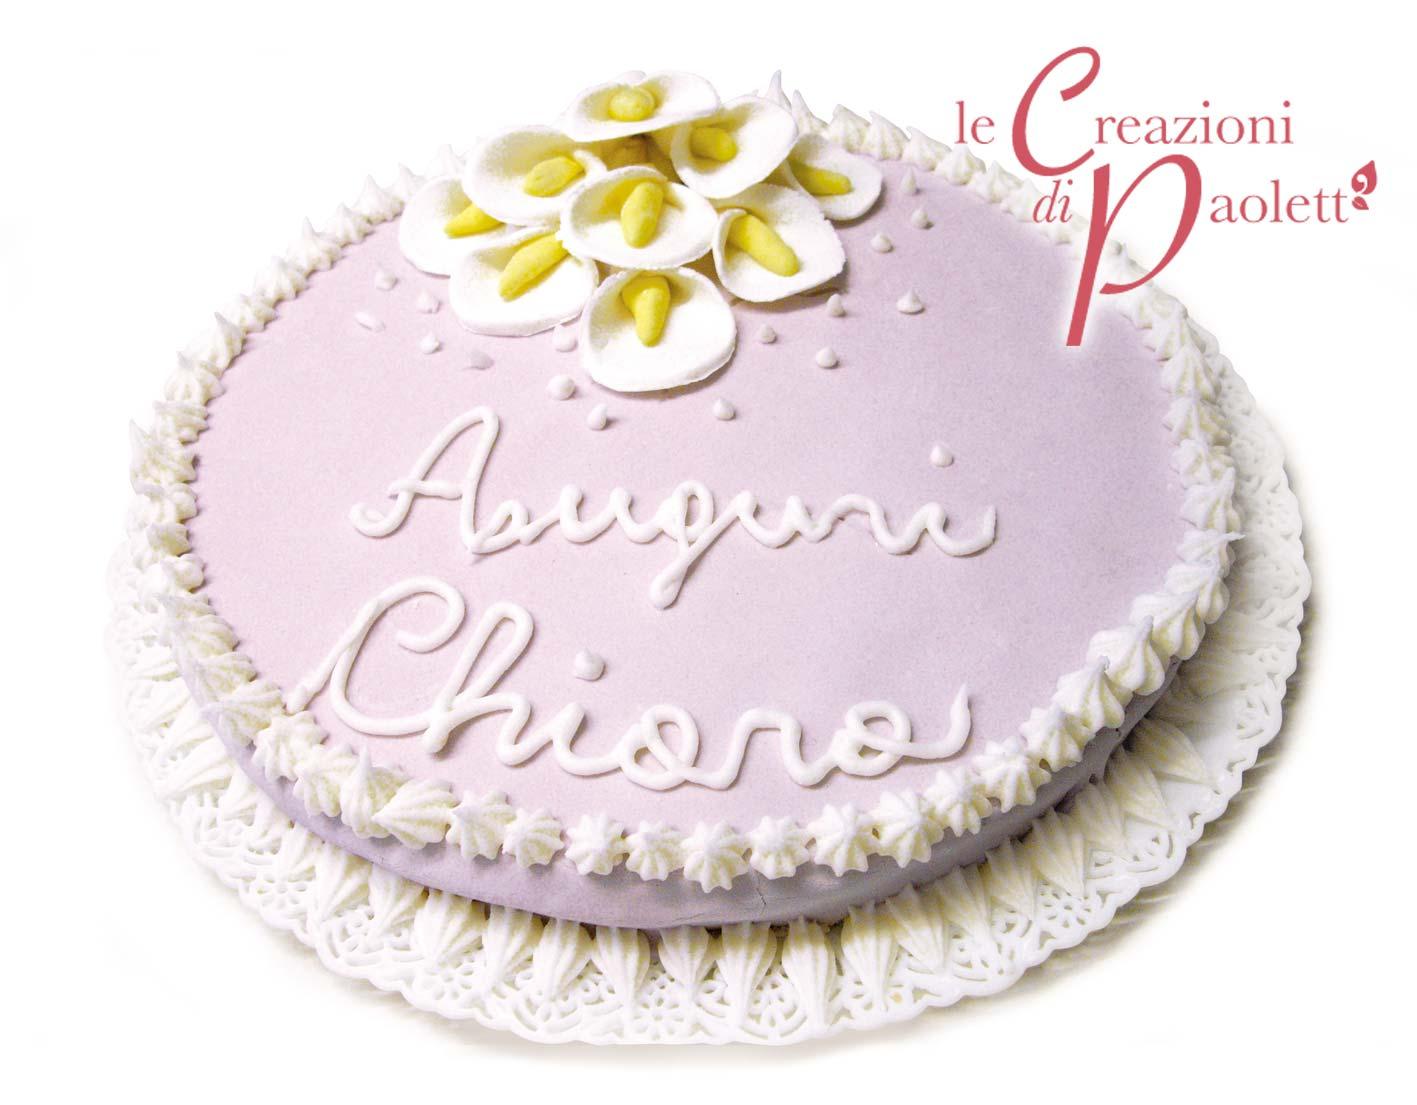 Torta compleanno 2 blog di paola - Bagno per torte senza liquore ...